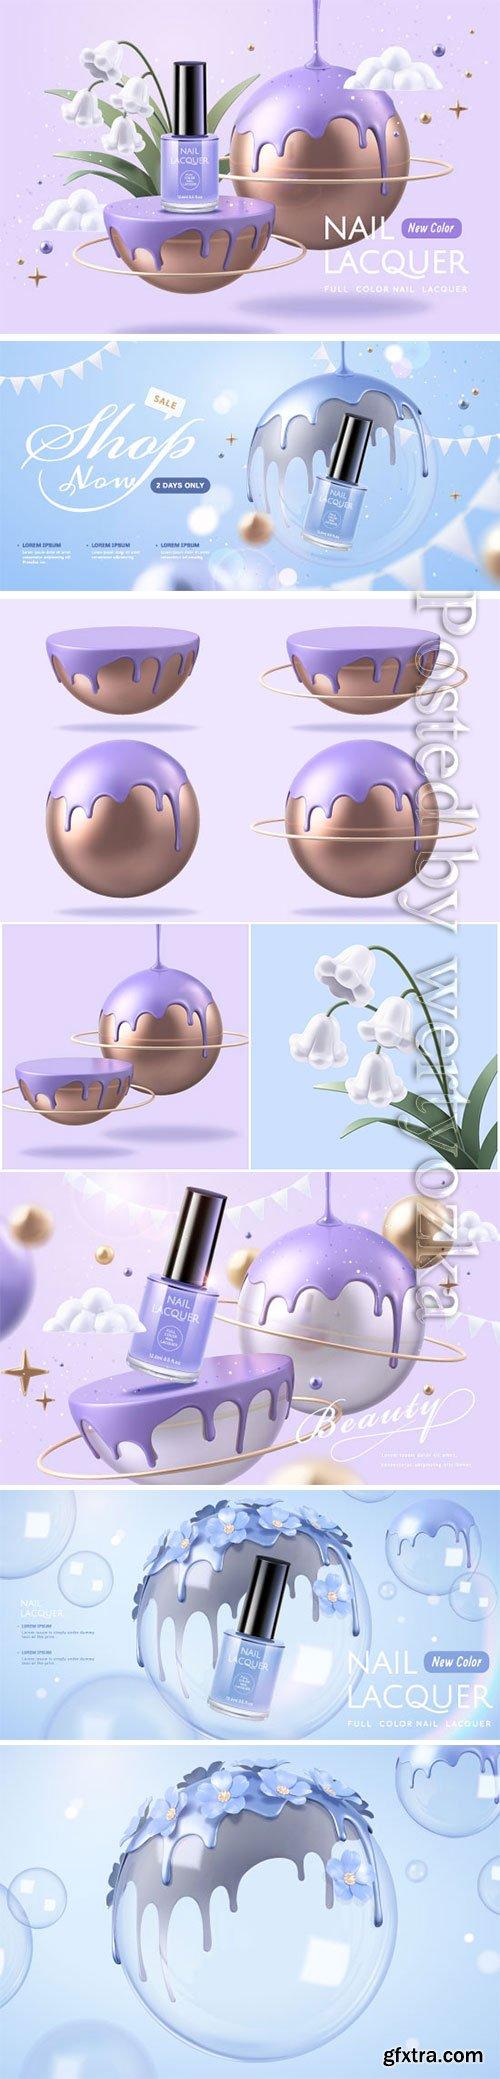 Purple nail lacquer ads